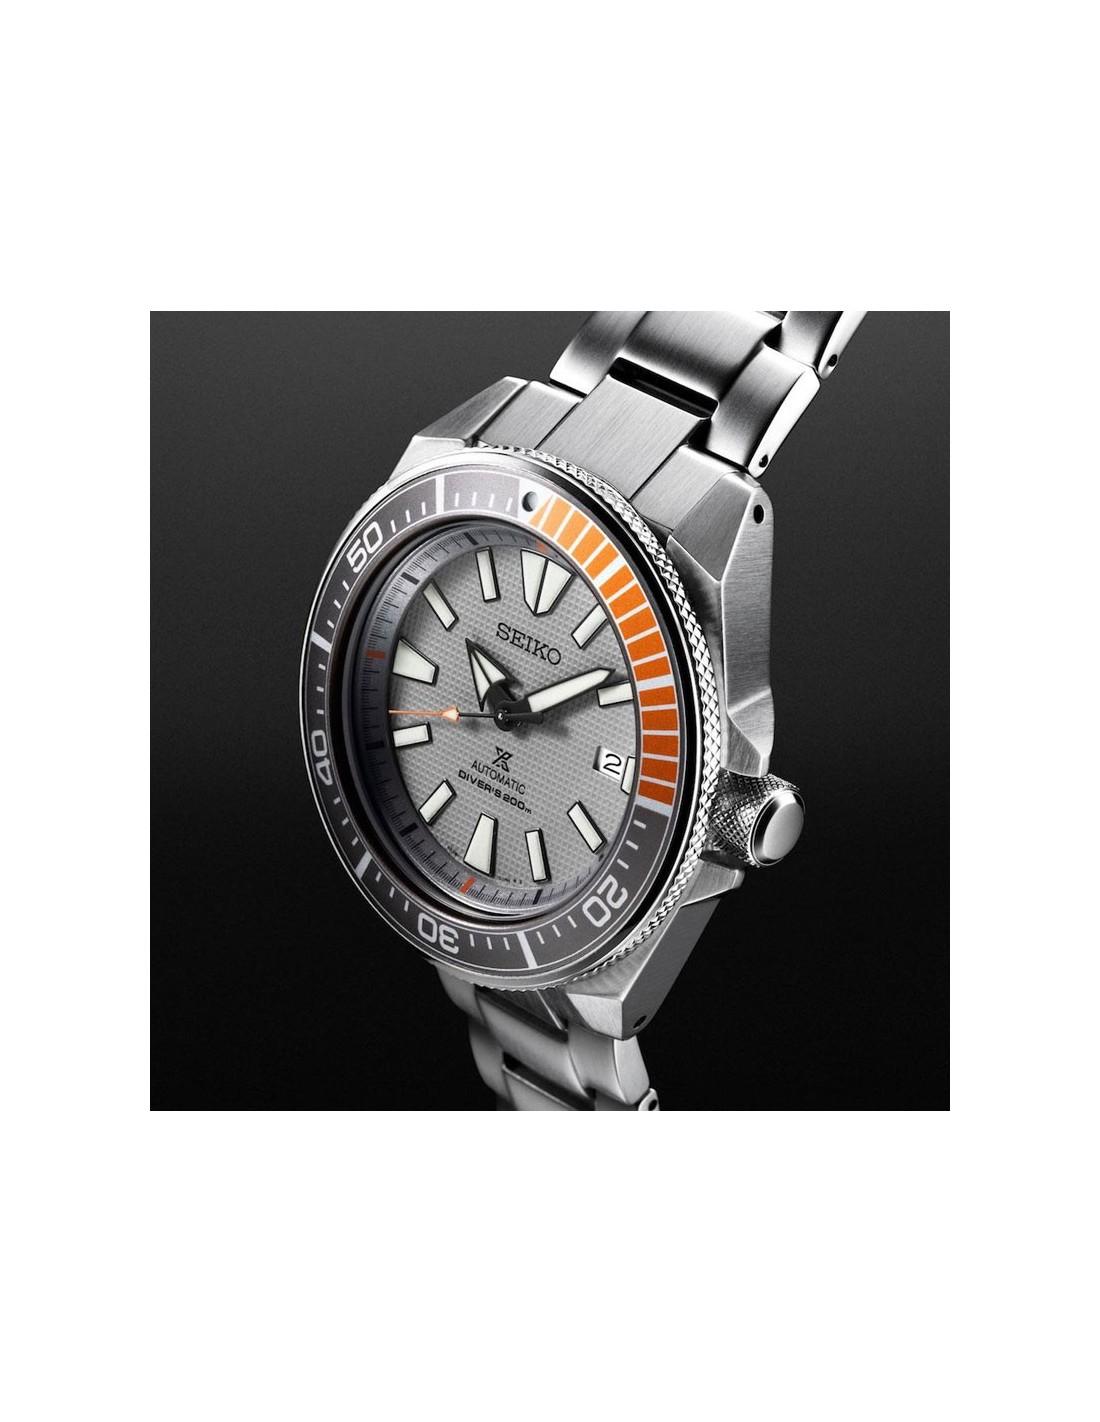 1edec45c20c ... Relógio SRPD01K1 Seiko Automatic Prospex Diver Samurai Dawn Grey ...